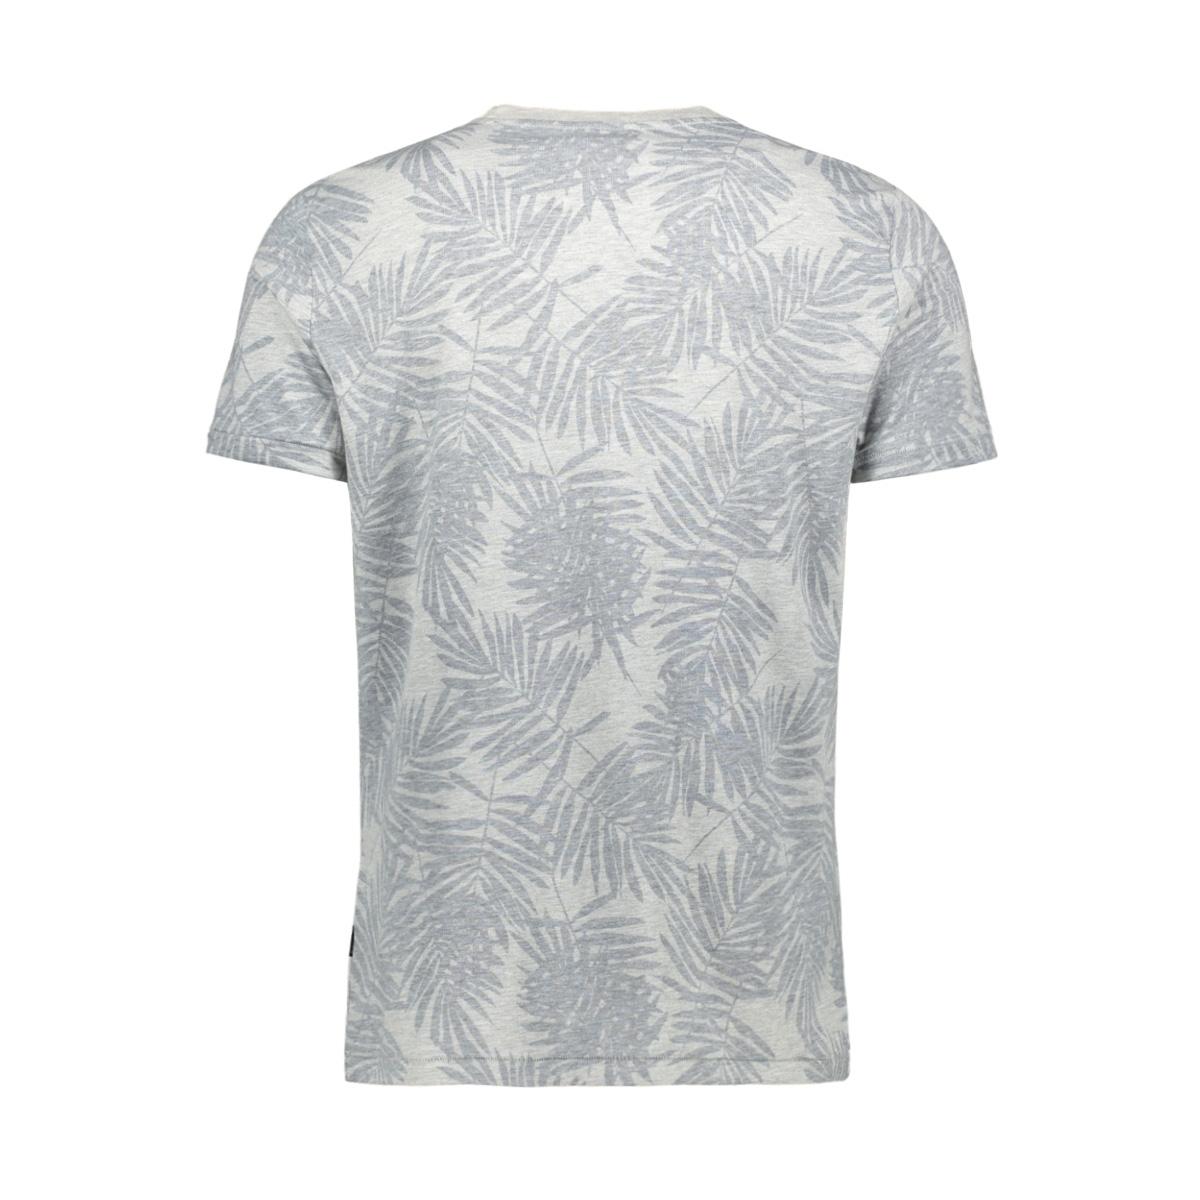 ts garden party 2001010204 kultivate t-shirt 153